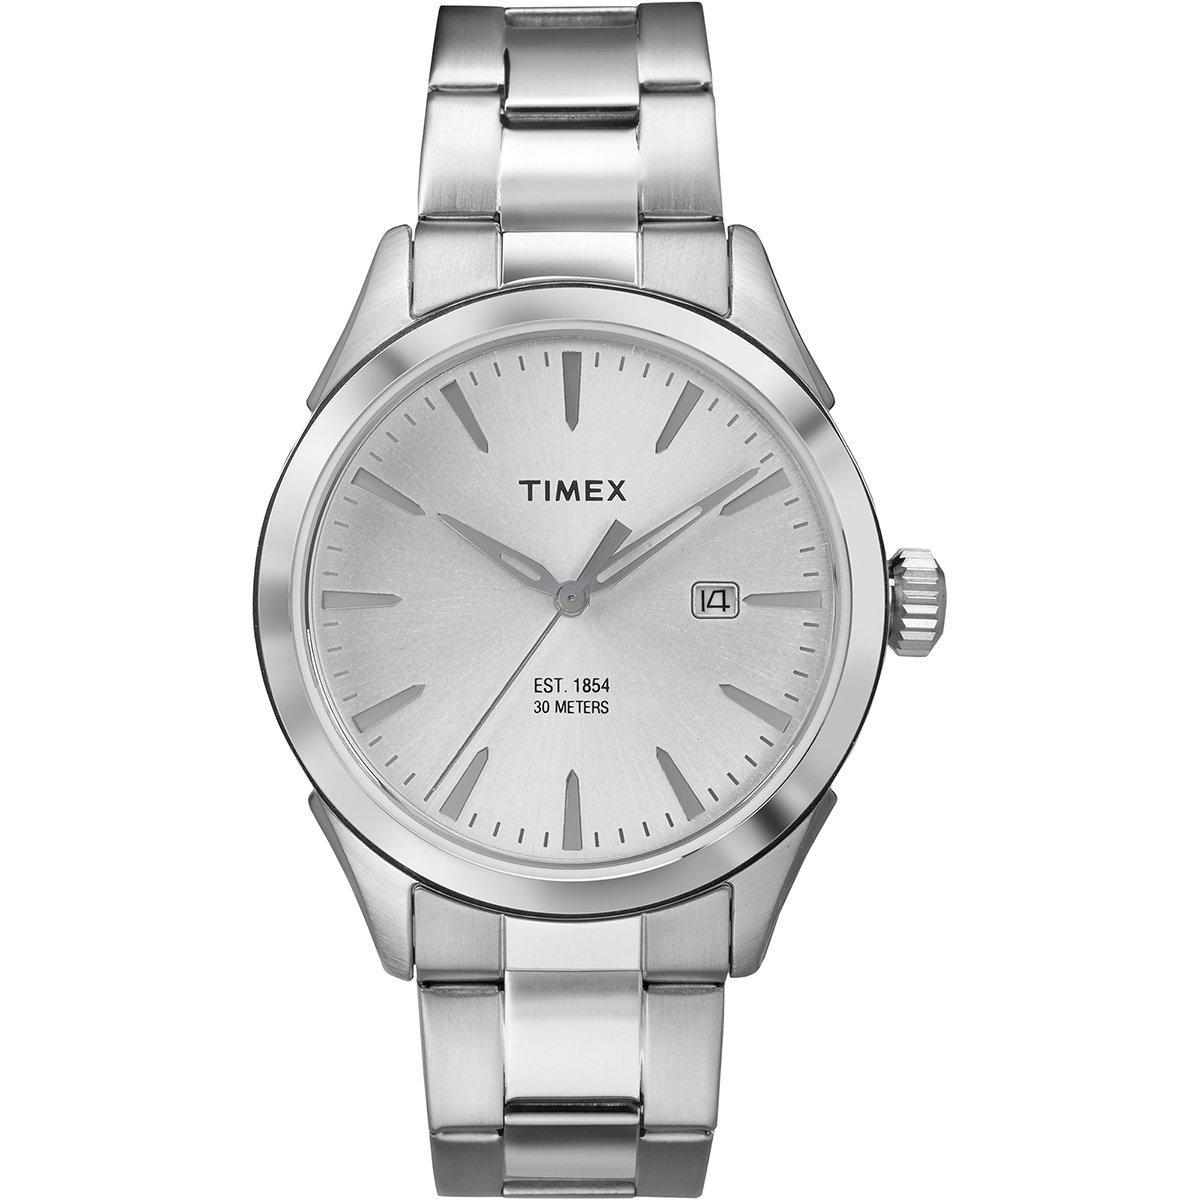 847fe8ab4f55 Reloj Caballero Timex TW2P77200